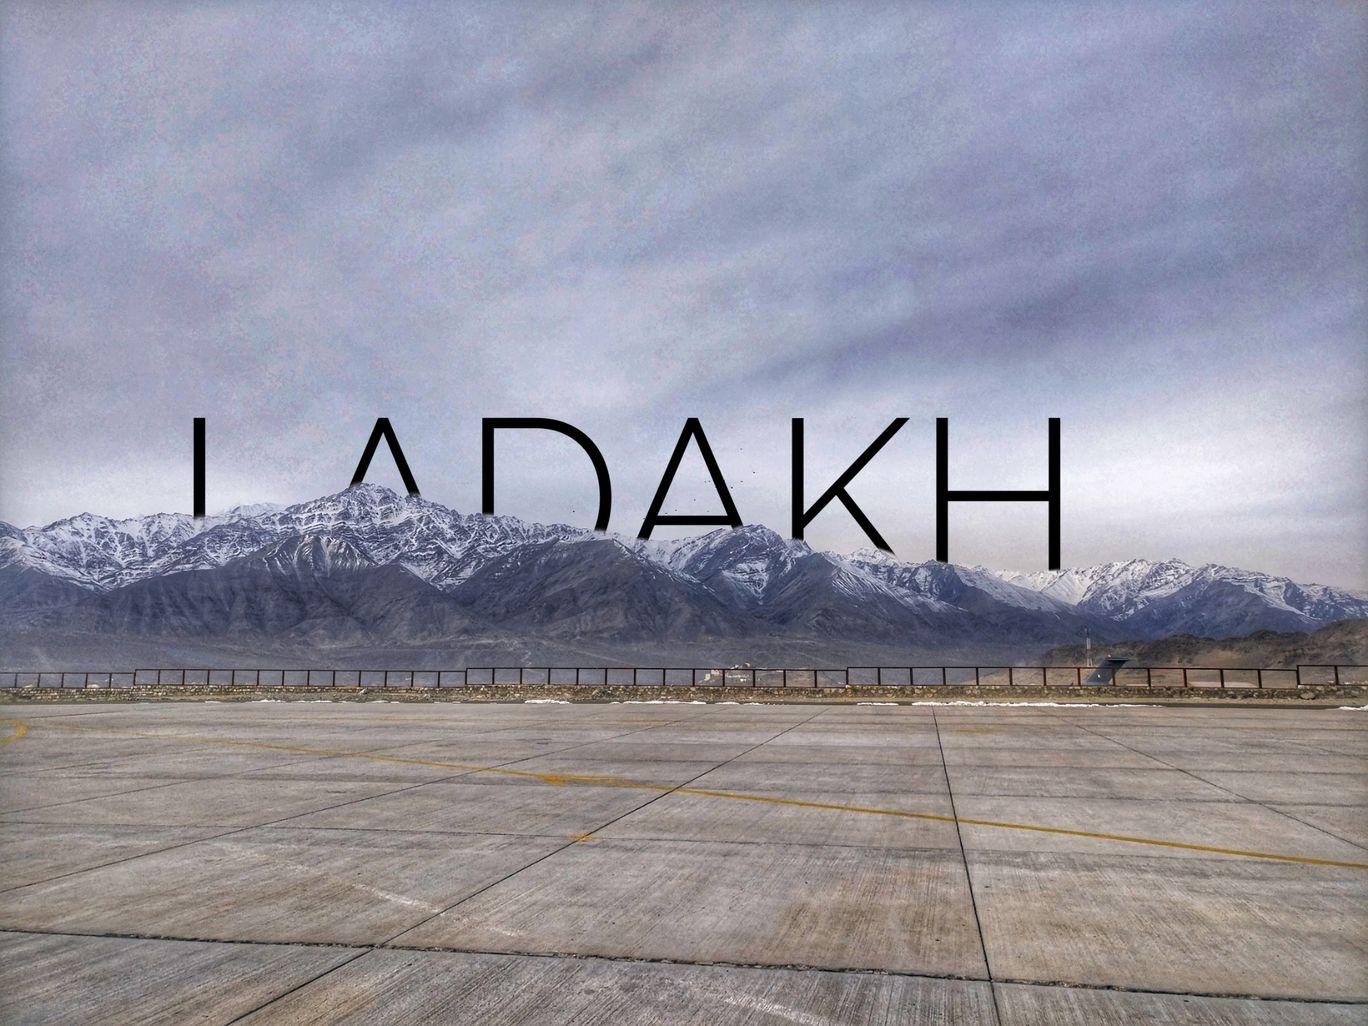 Photo of Chadar trek - Trekking In Ladakh - Frozen River Trekking In Ladakh By Subham Somani